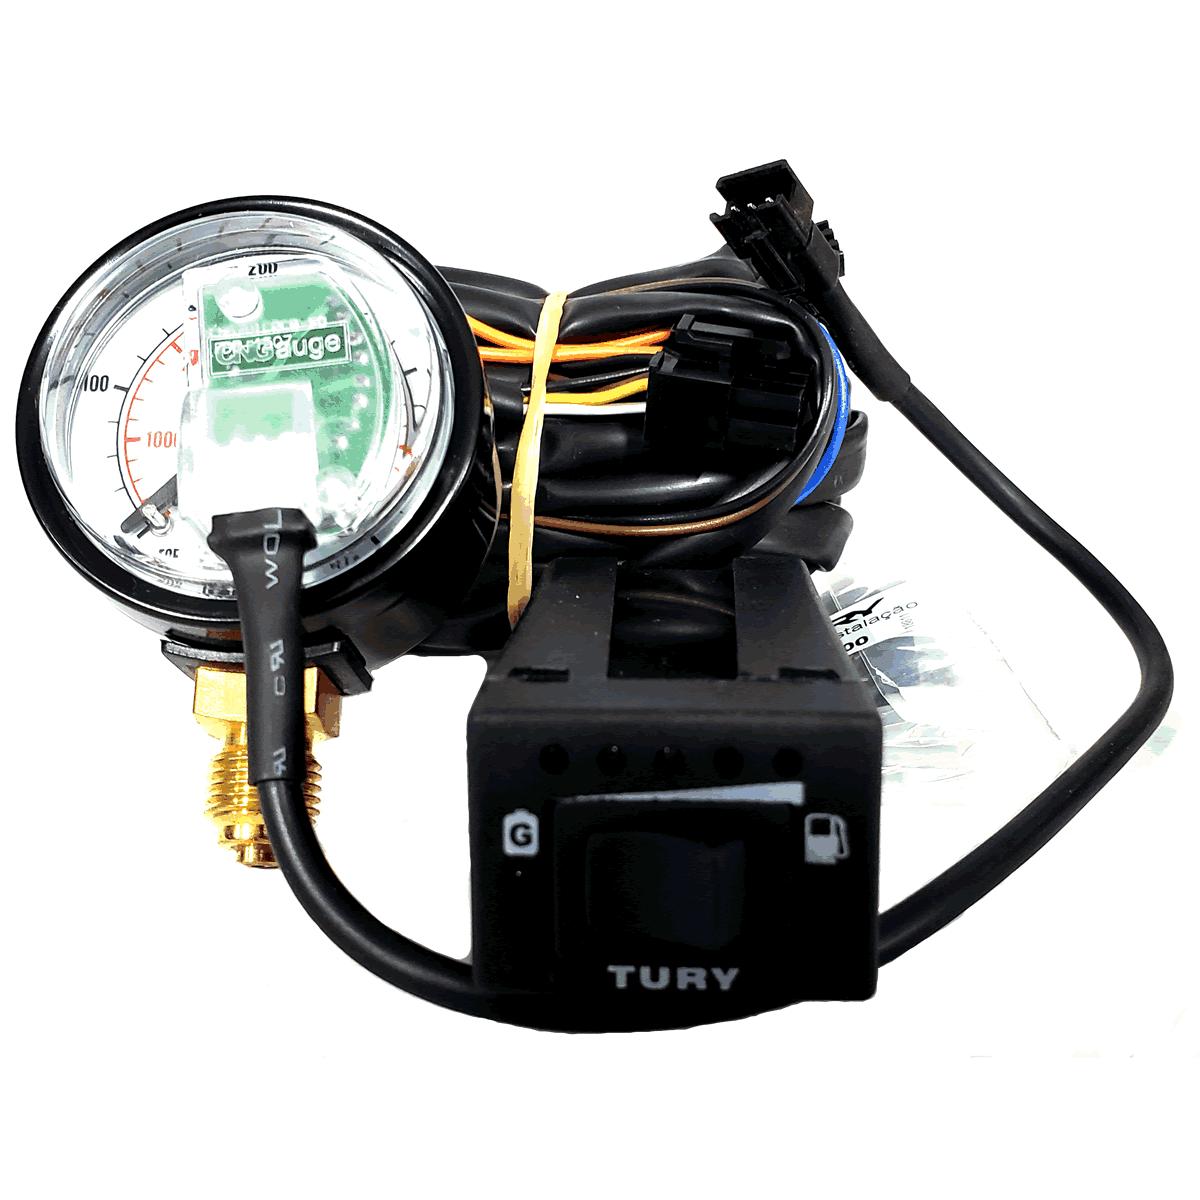 Conjunto Elétrico TURY GAS Chave Manômetro e Chicote T1000A